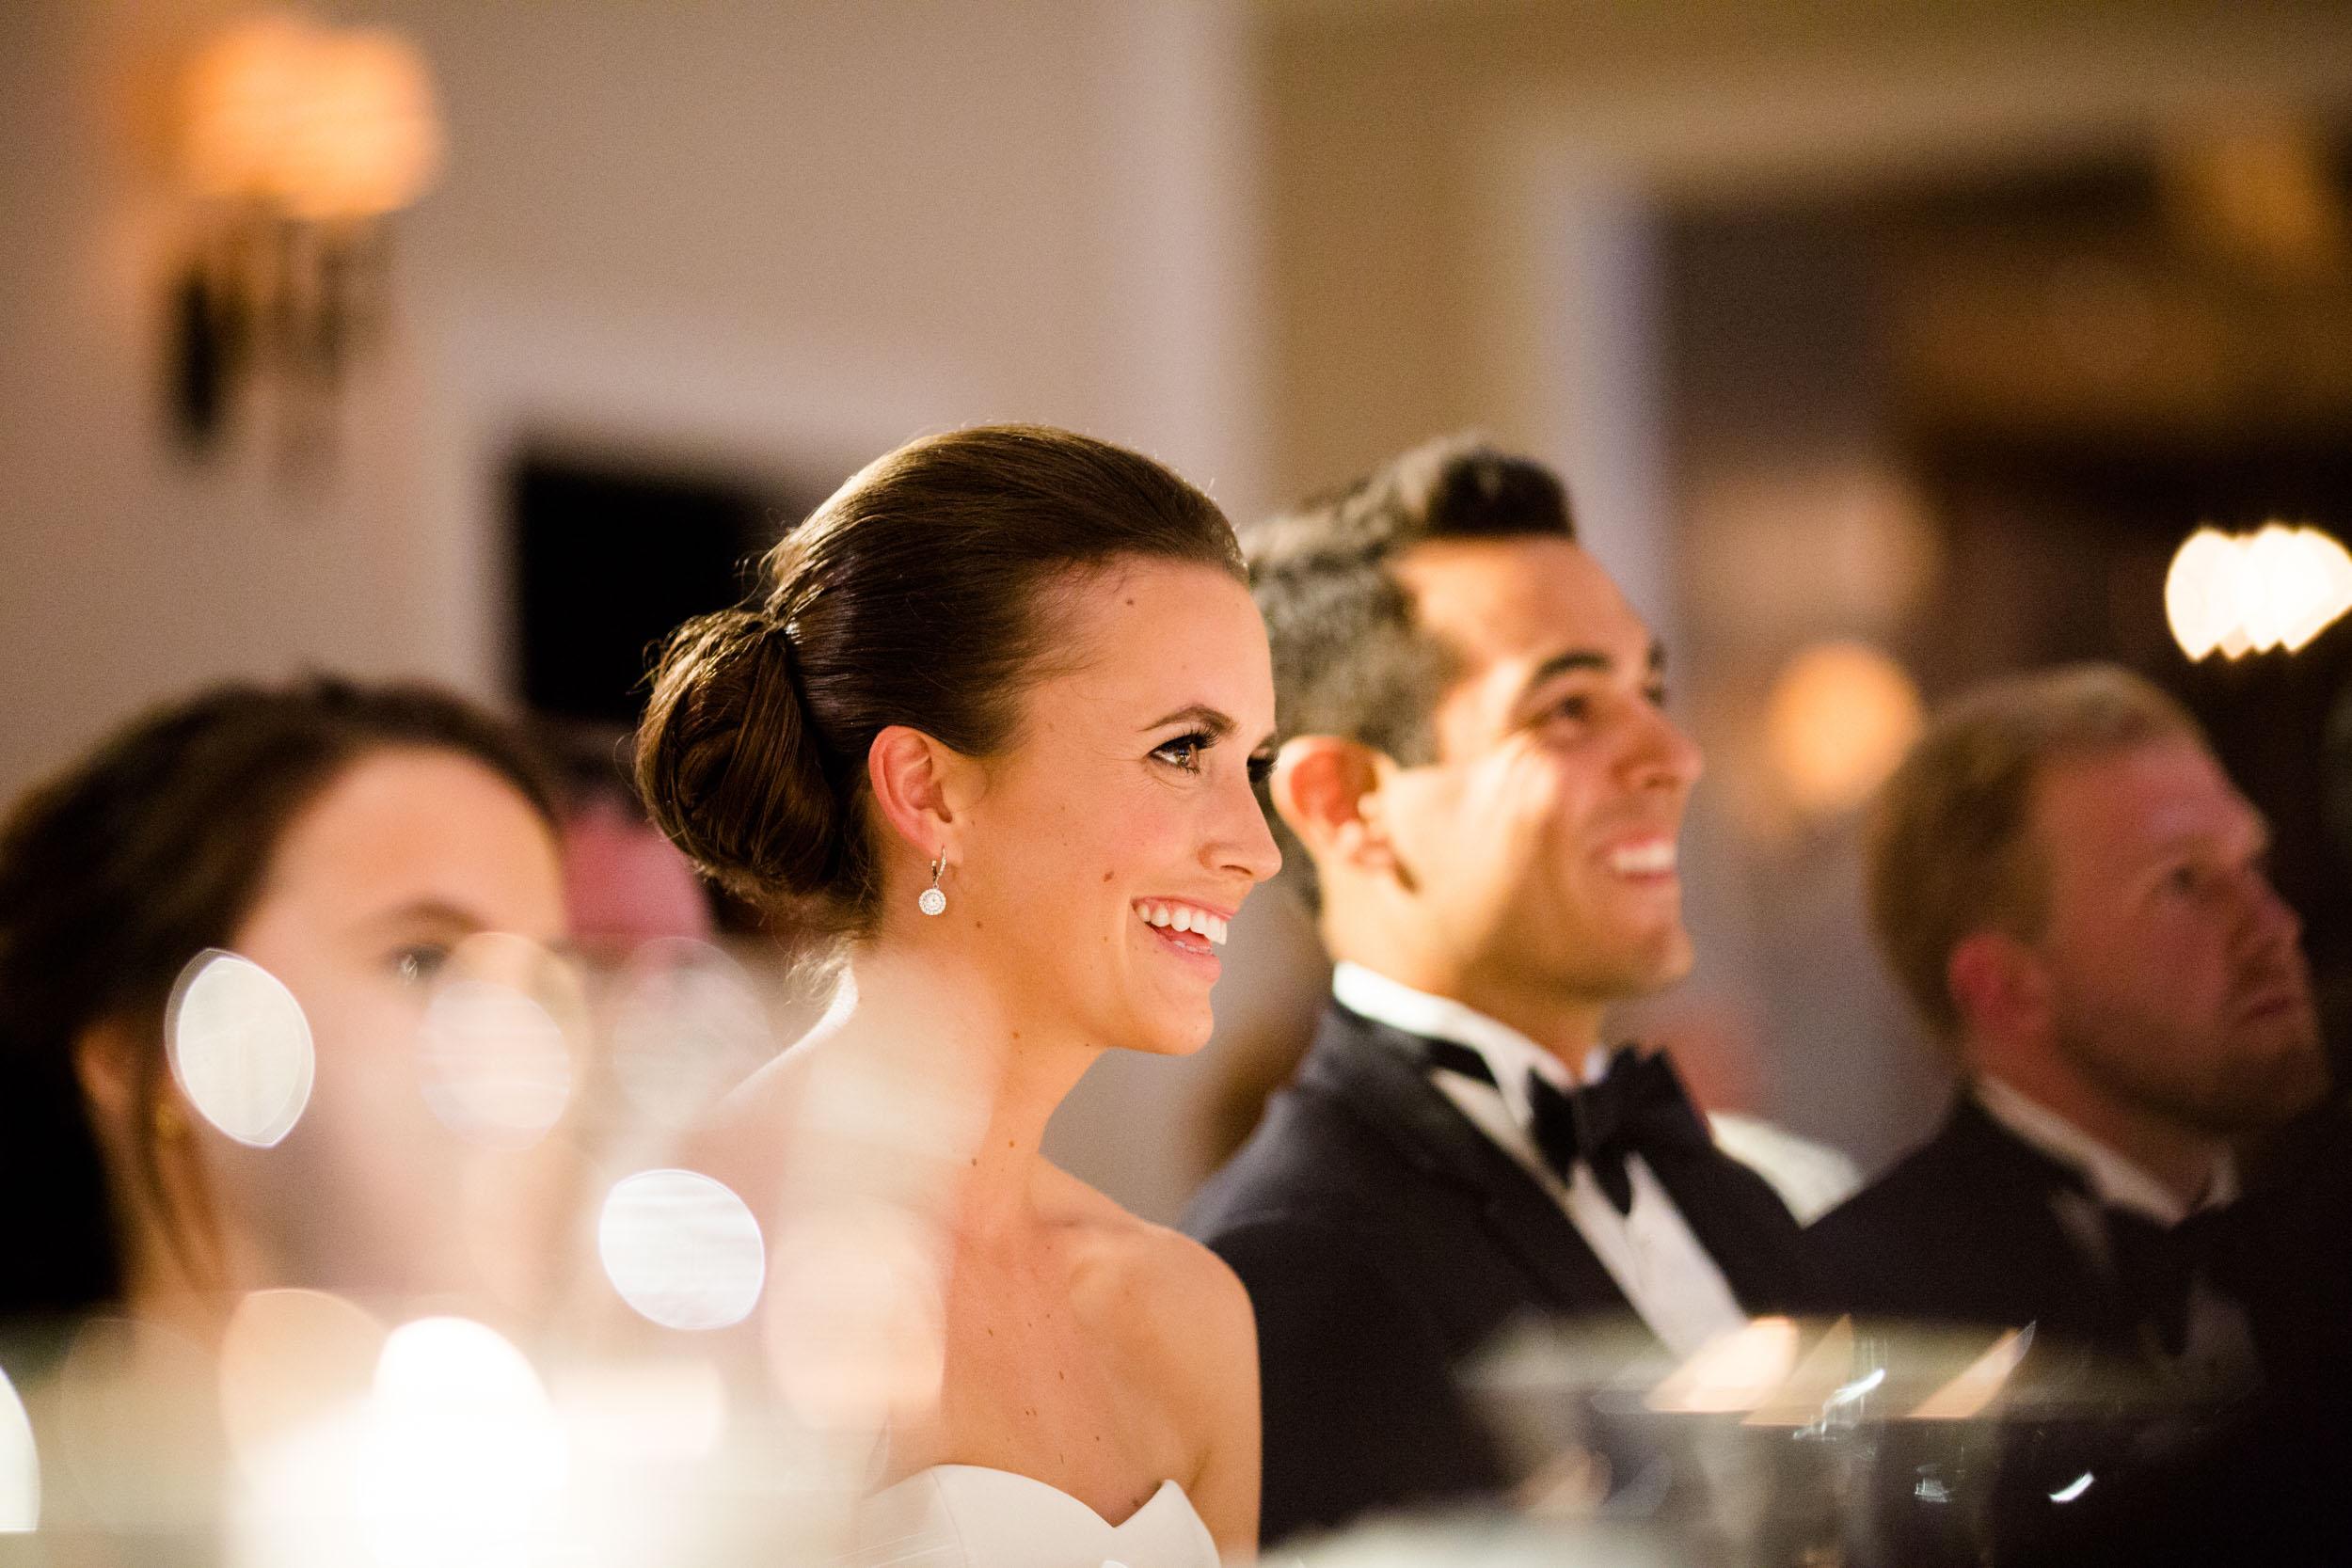 Bride and groom at wedding reception in Kiawah Island, South Carolina.